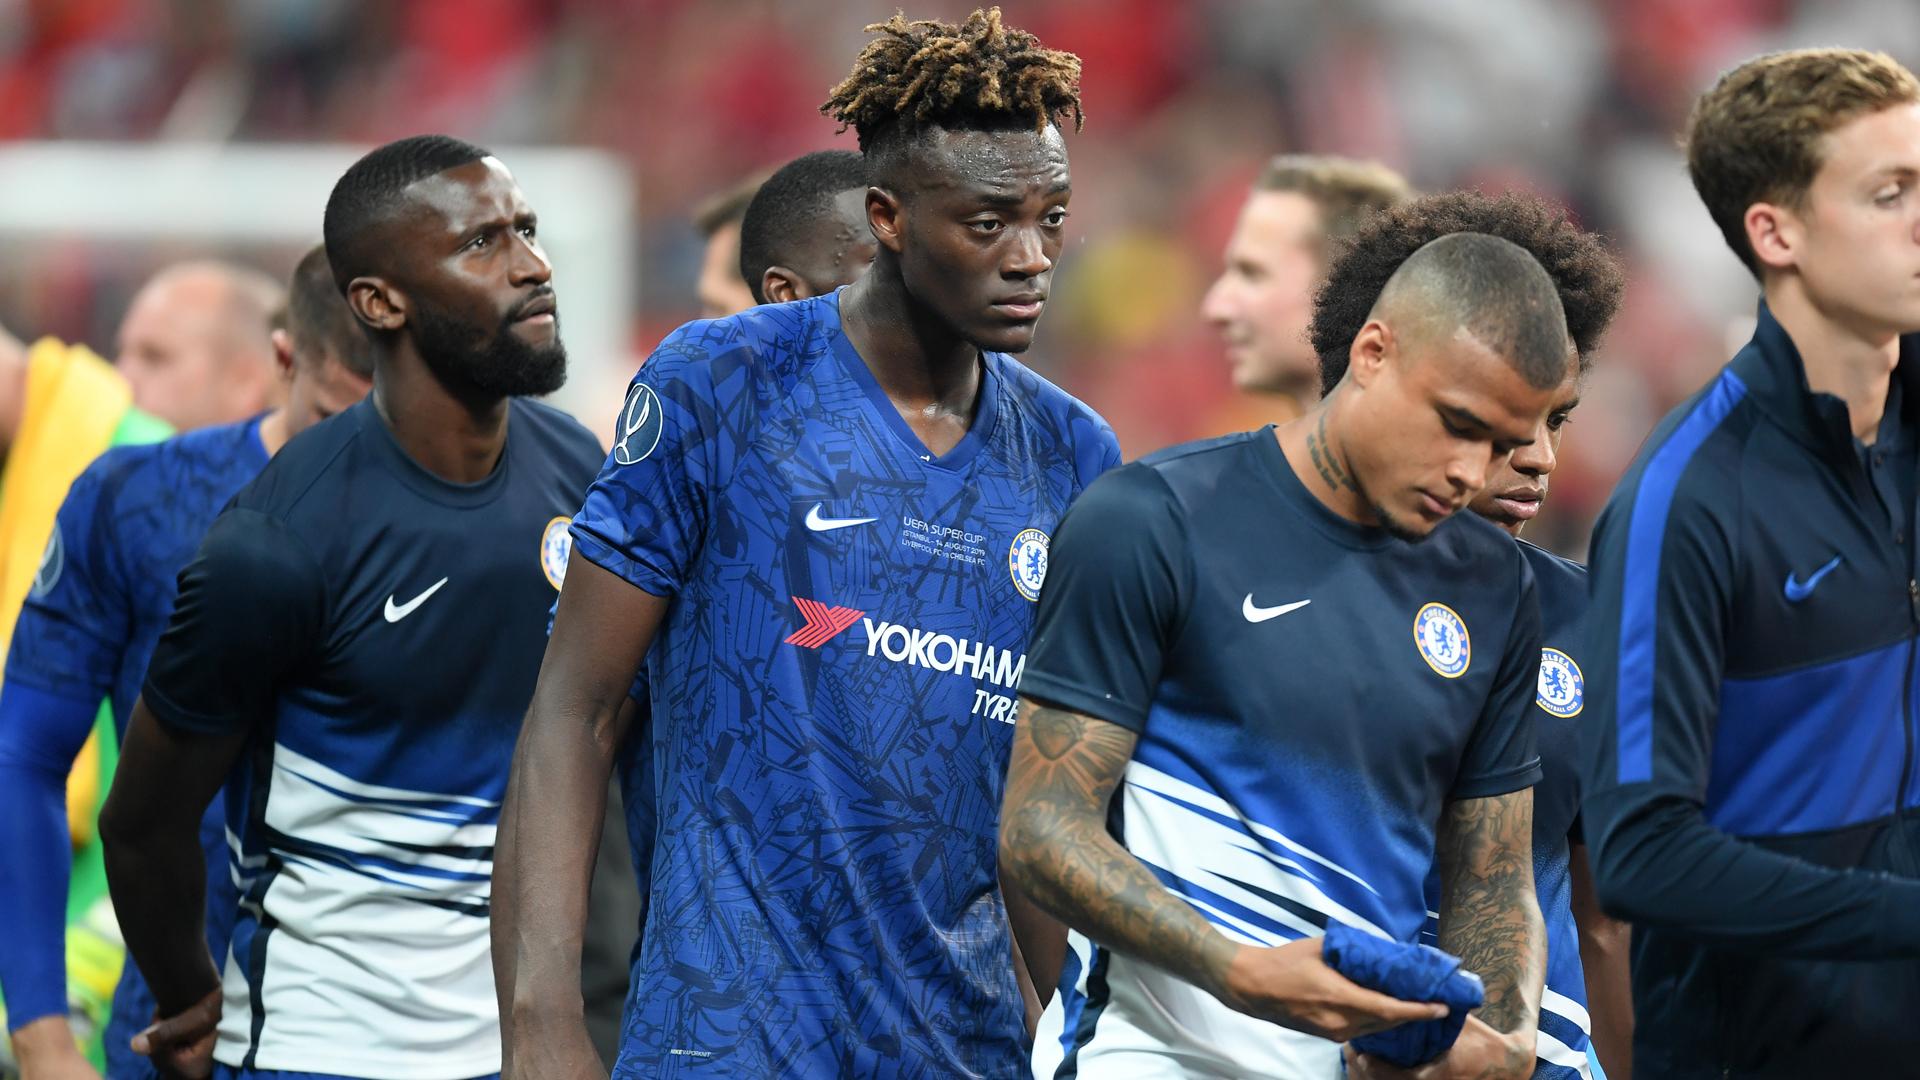 Abraham retaining belief despite UEFA Super Cup penalty miss